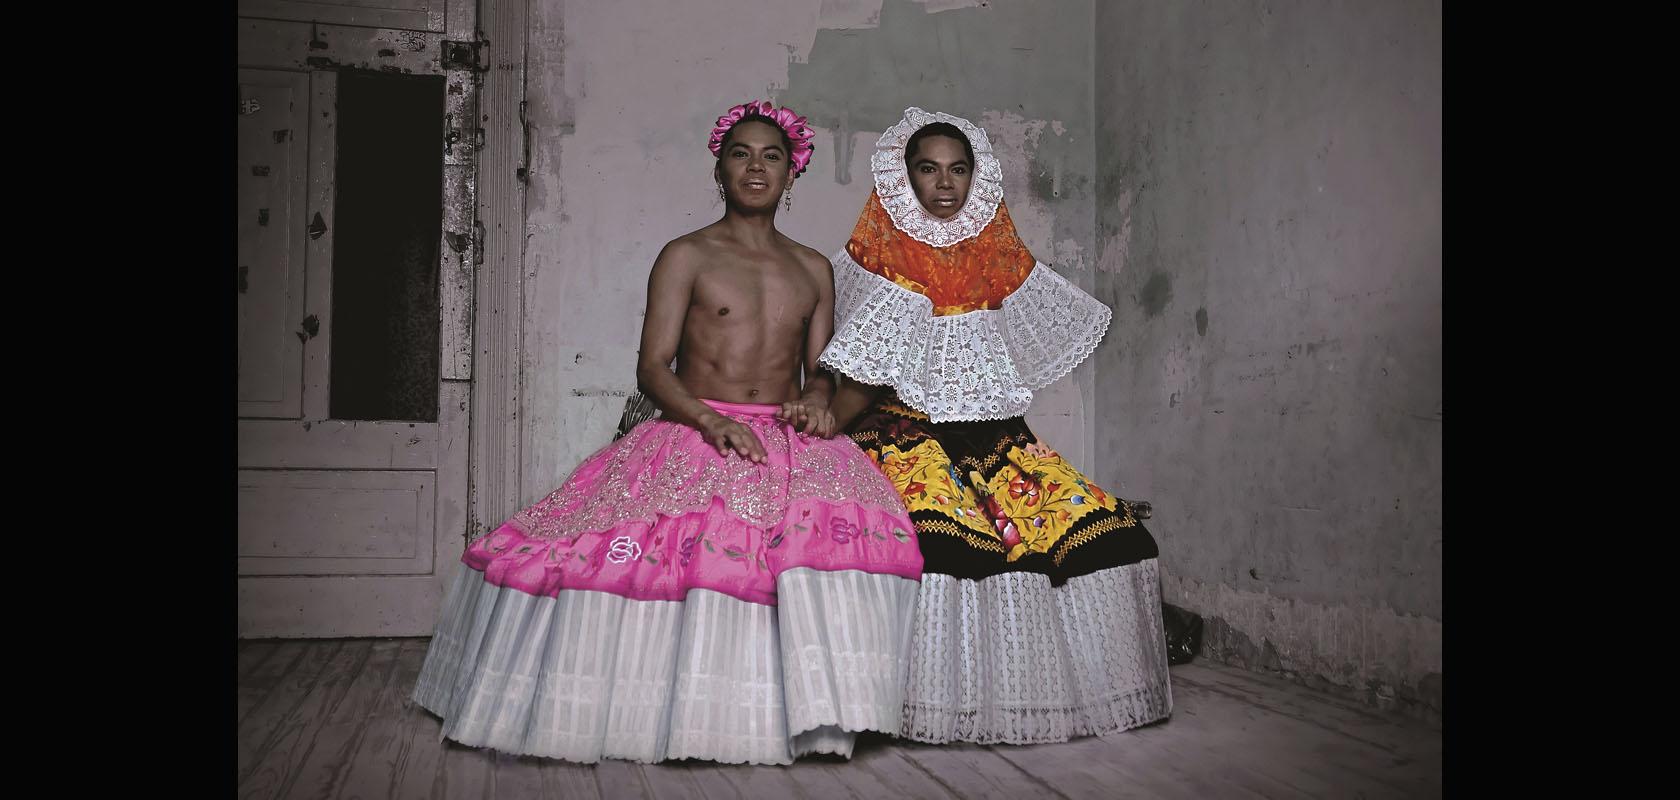 What-a-Genderful-World_Tropenmuseum-Muxe_-3e-gender-Mexico__Creditline-Mario-Patino-Sanchez_-Photography.-Lukas-Avendano_-Muxhe-Model